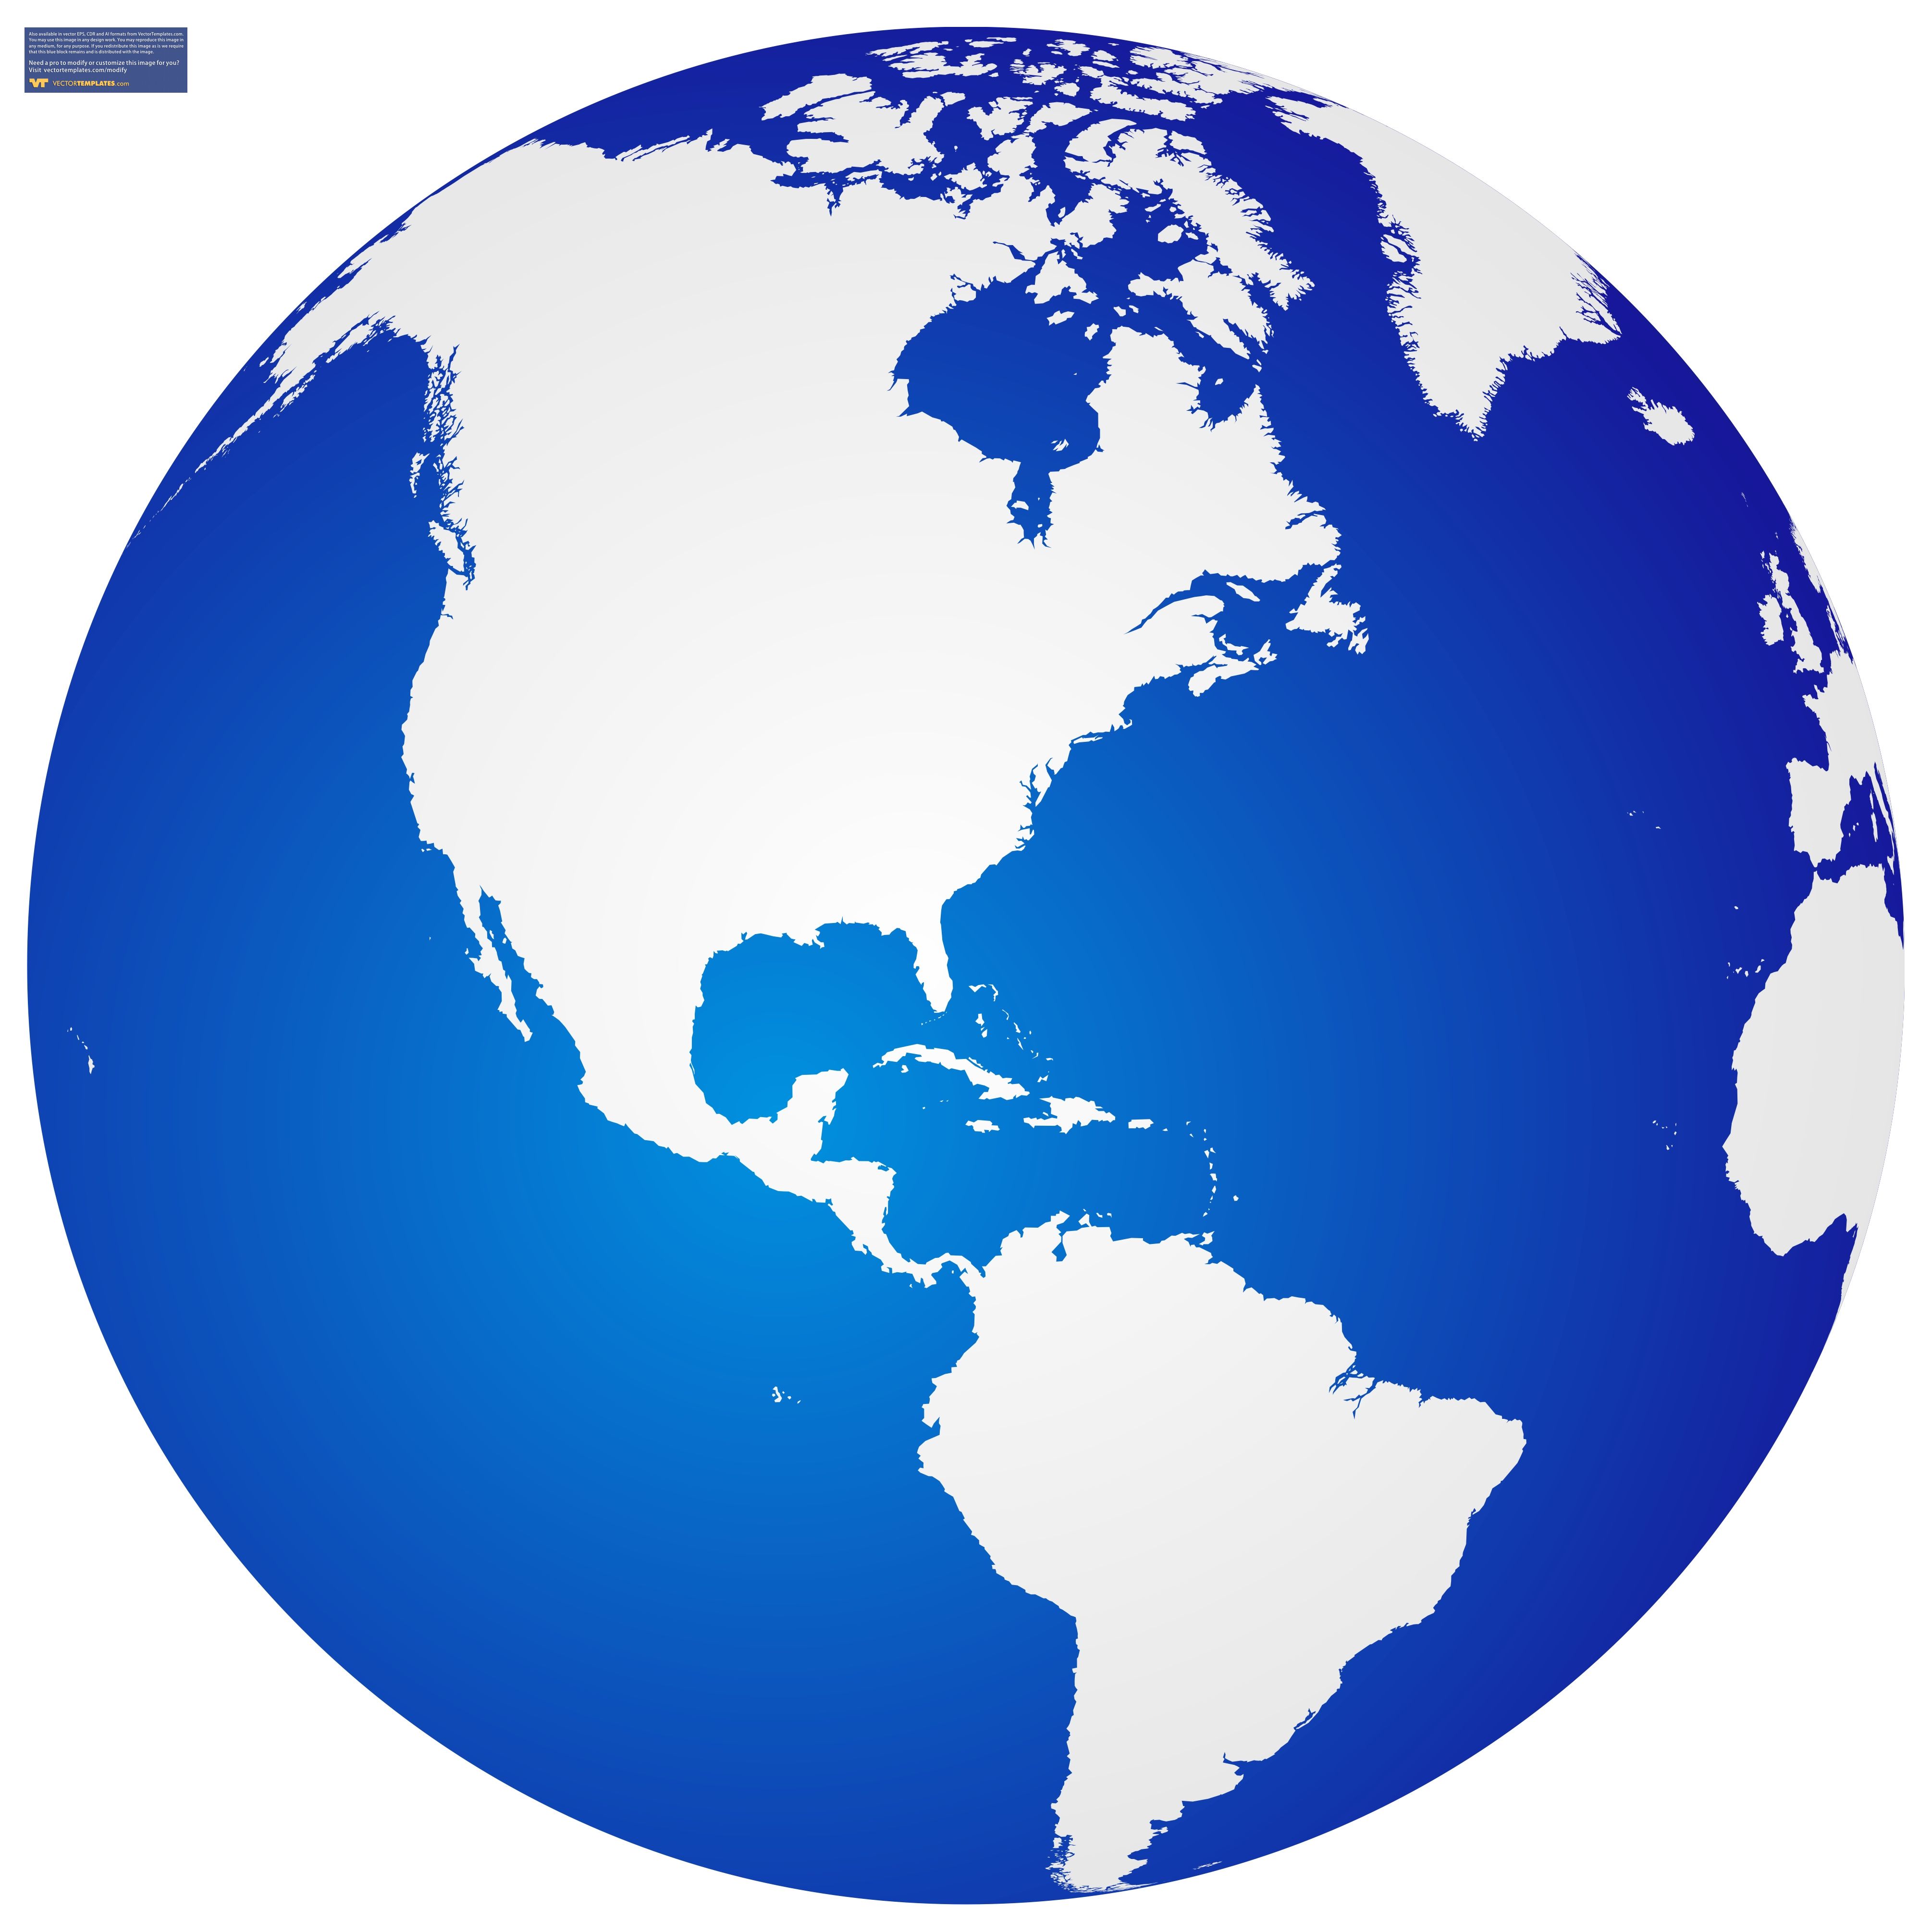 Globe clipart vector clip transparent Globes | Clipart Panda - Free Clipart Images | Four Clowns Project ... clip transparent